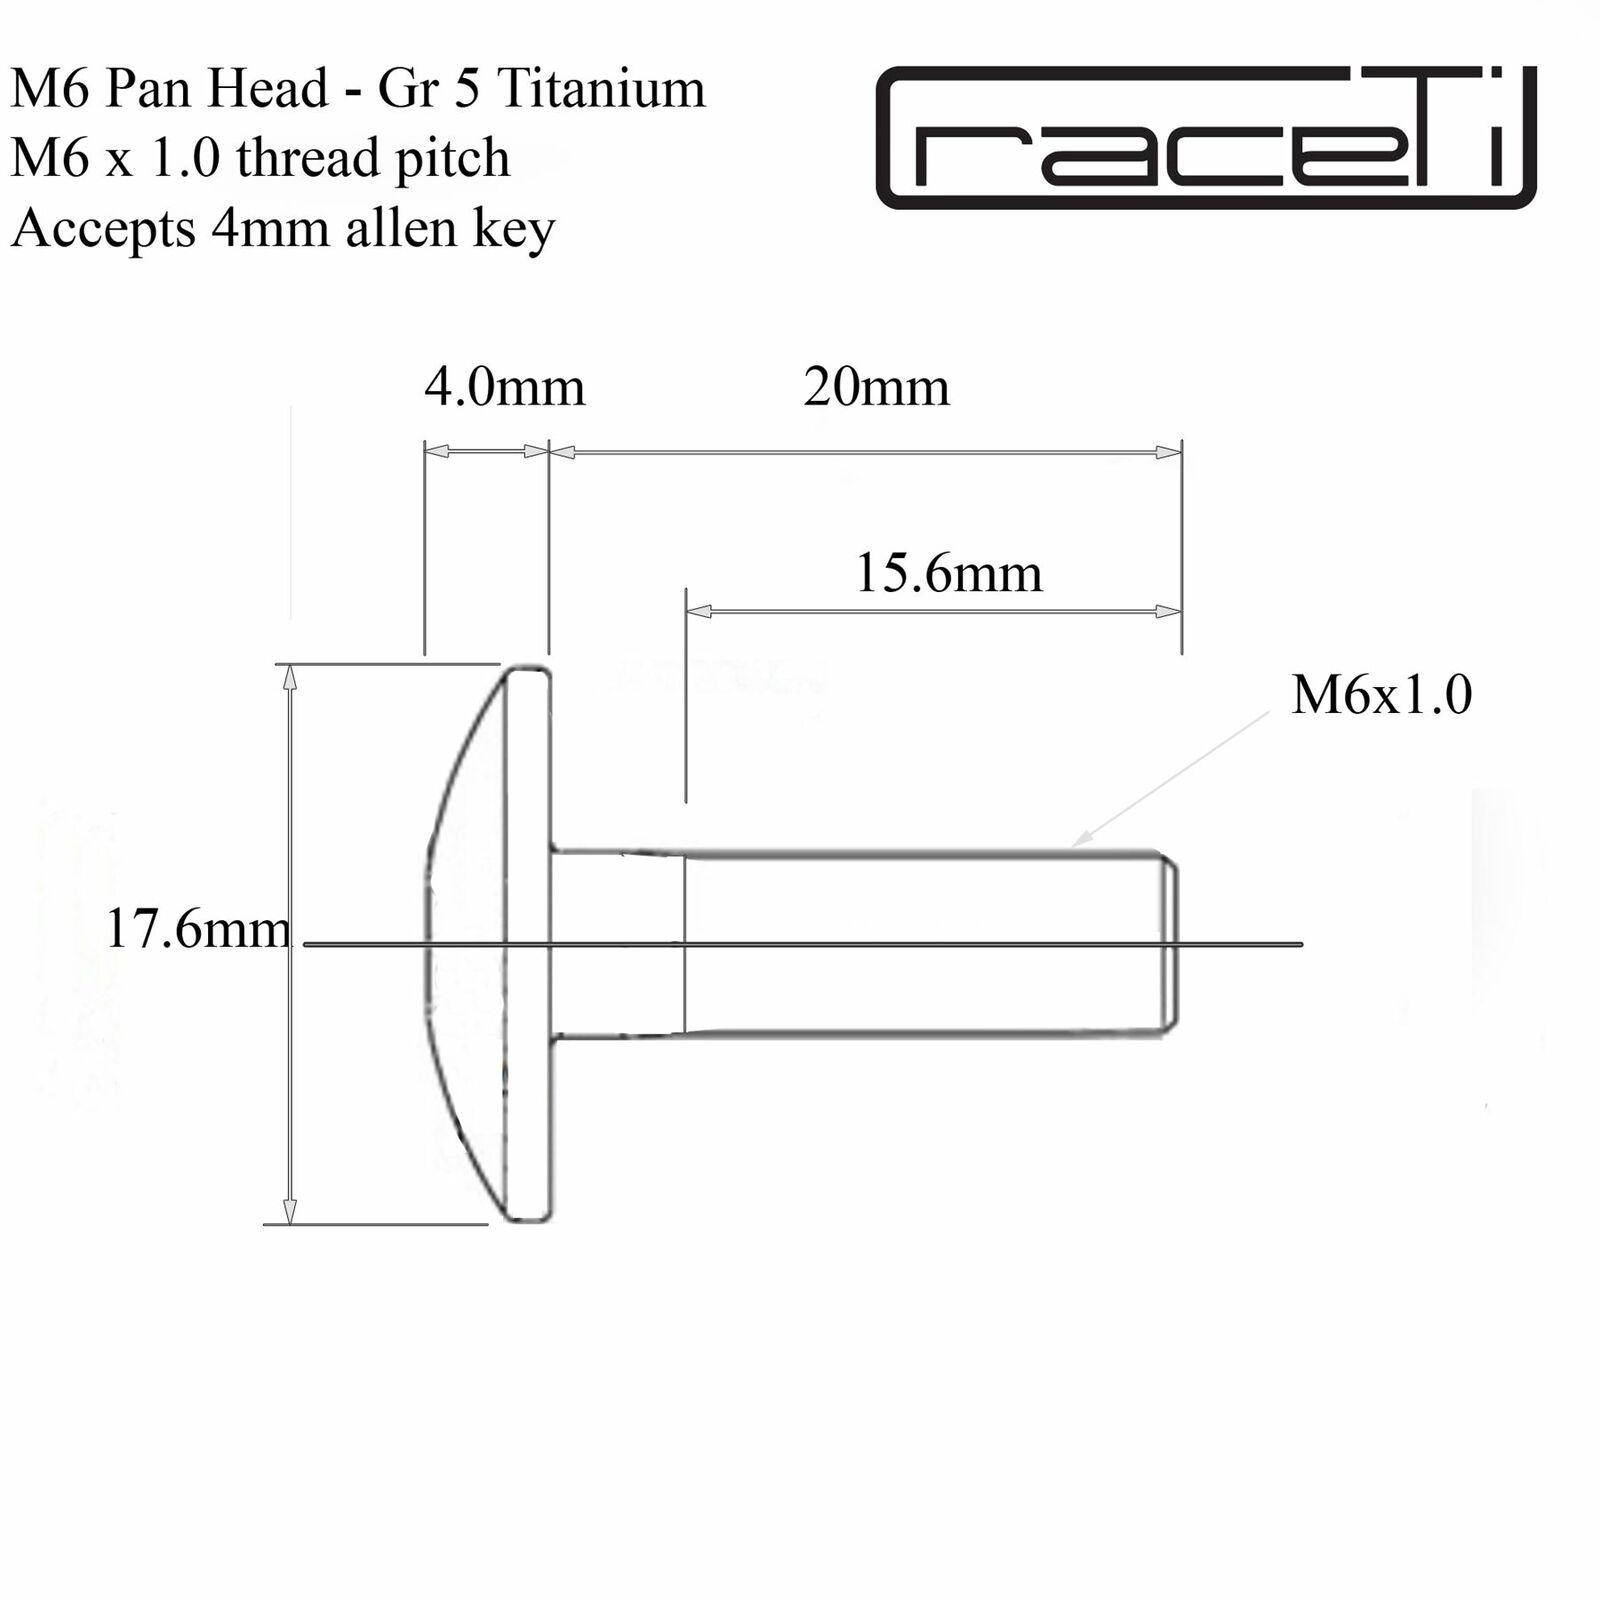 M6 titane PAN vis à tête 20 x 1.0 CNC gr5 Ti 6Al-4V Ultralight 20 mm x 1.0 mm